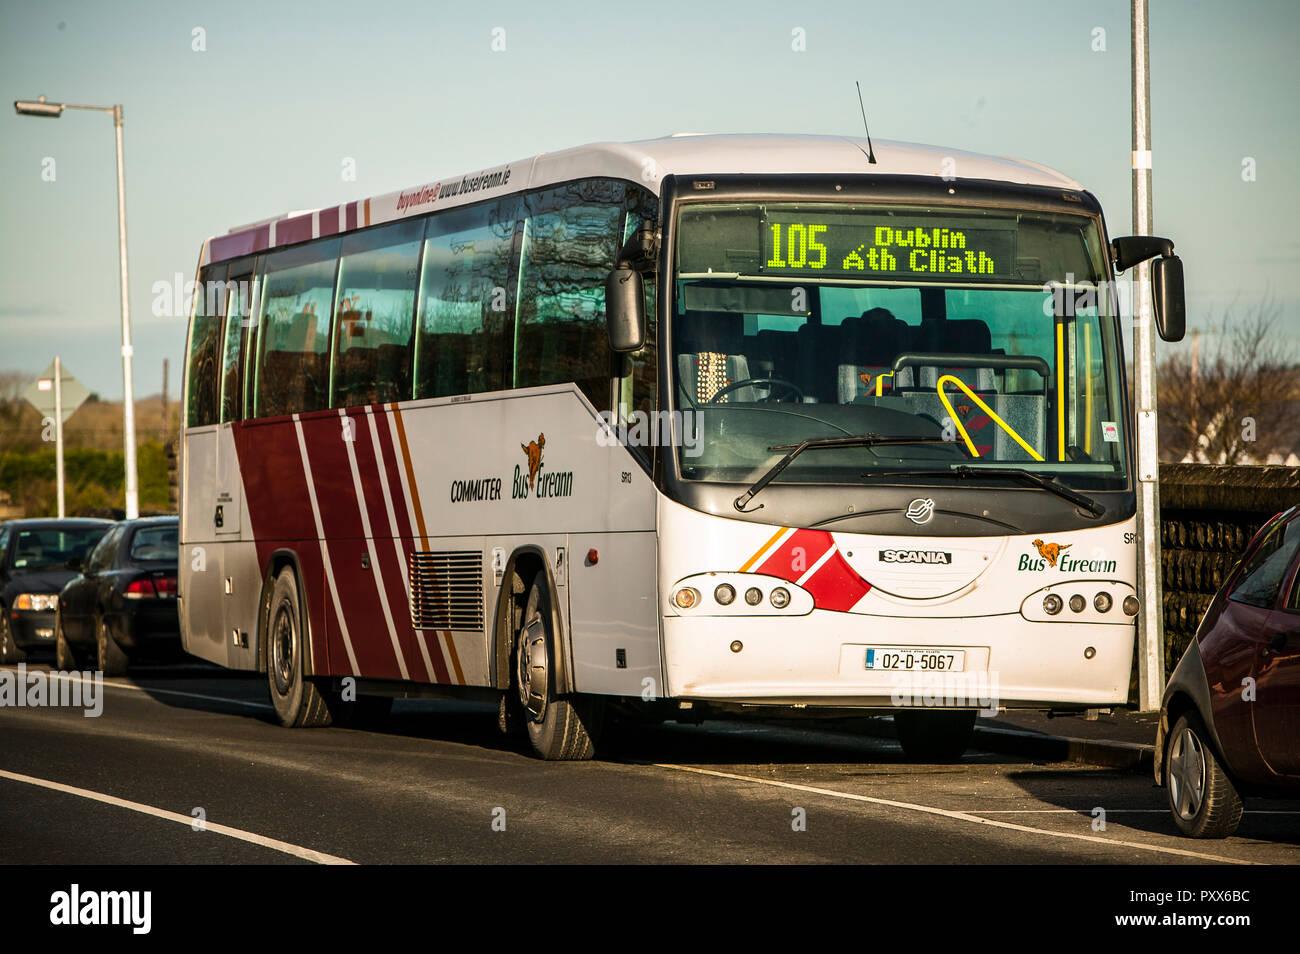 Commuter Bus Eireann Stock Photo: 223081248 - Alamy